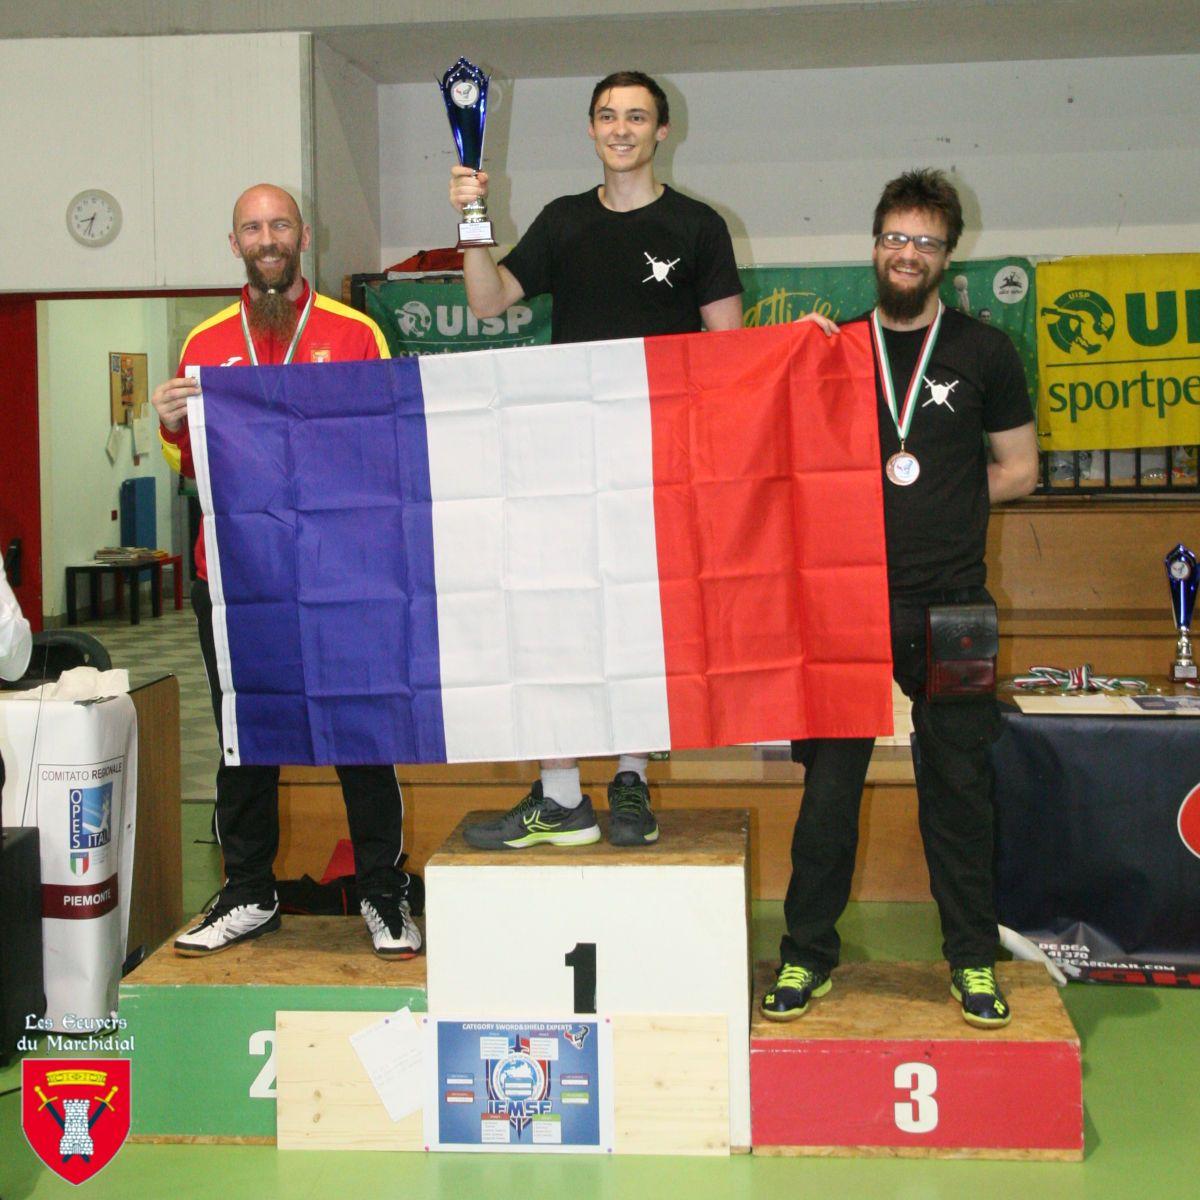 2017-11-17-Tournoi-MSF-Turin-14-marchidial.fr_